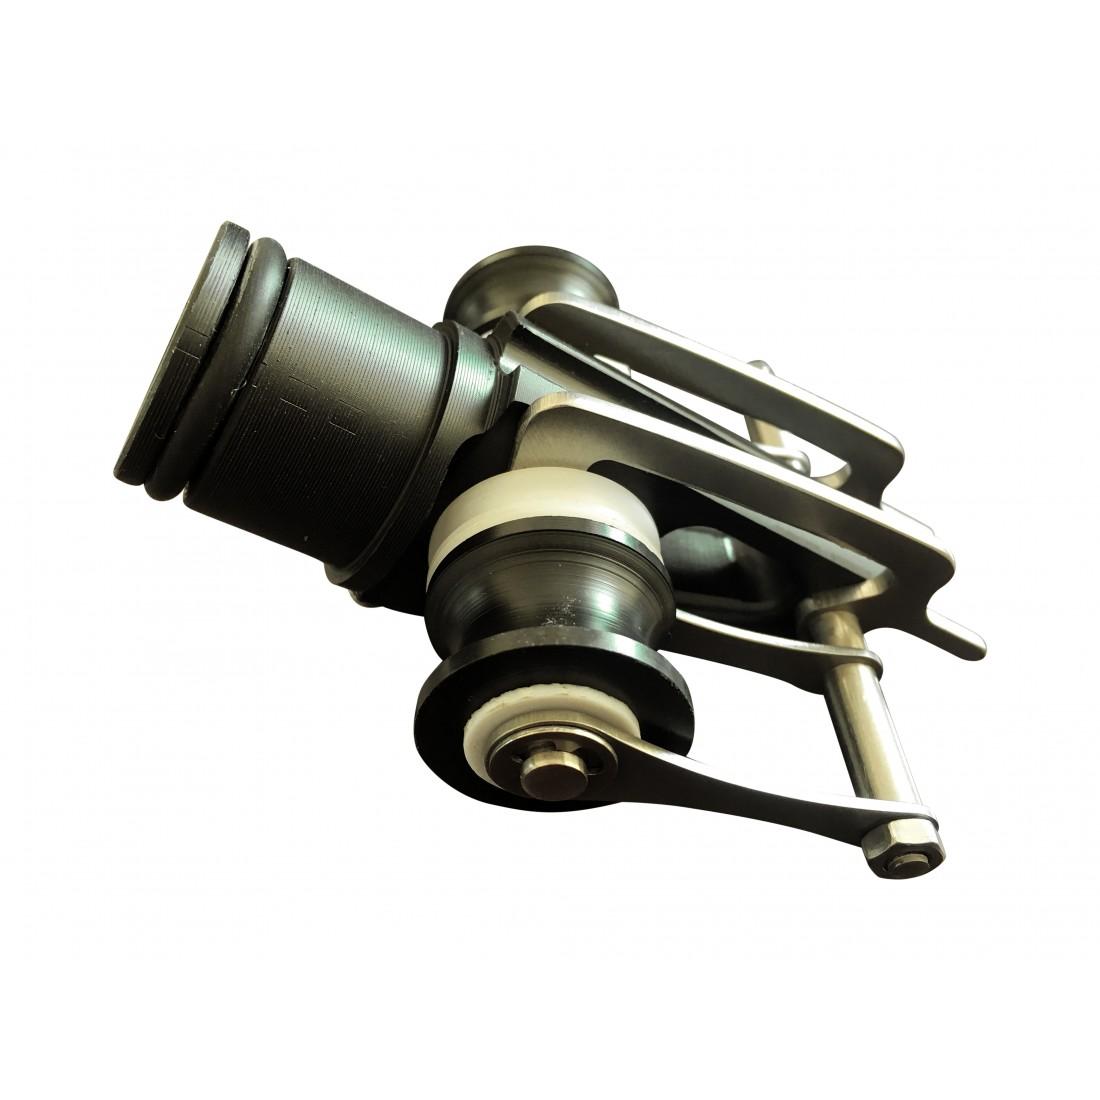 Mvd -Roller Head Pro G2 Dual System